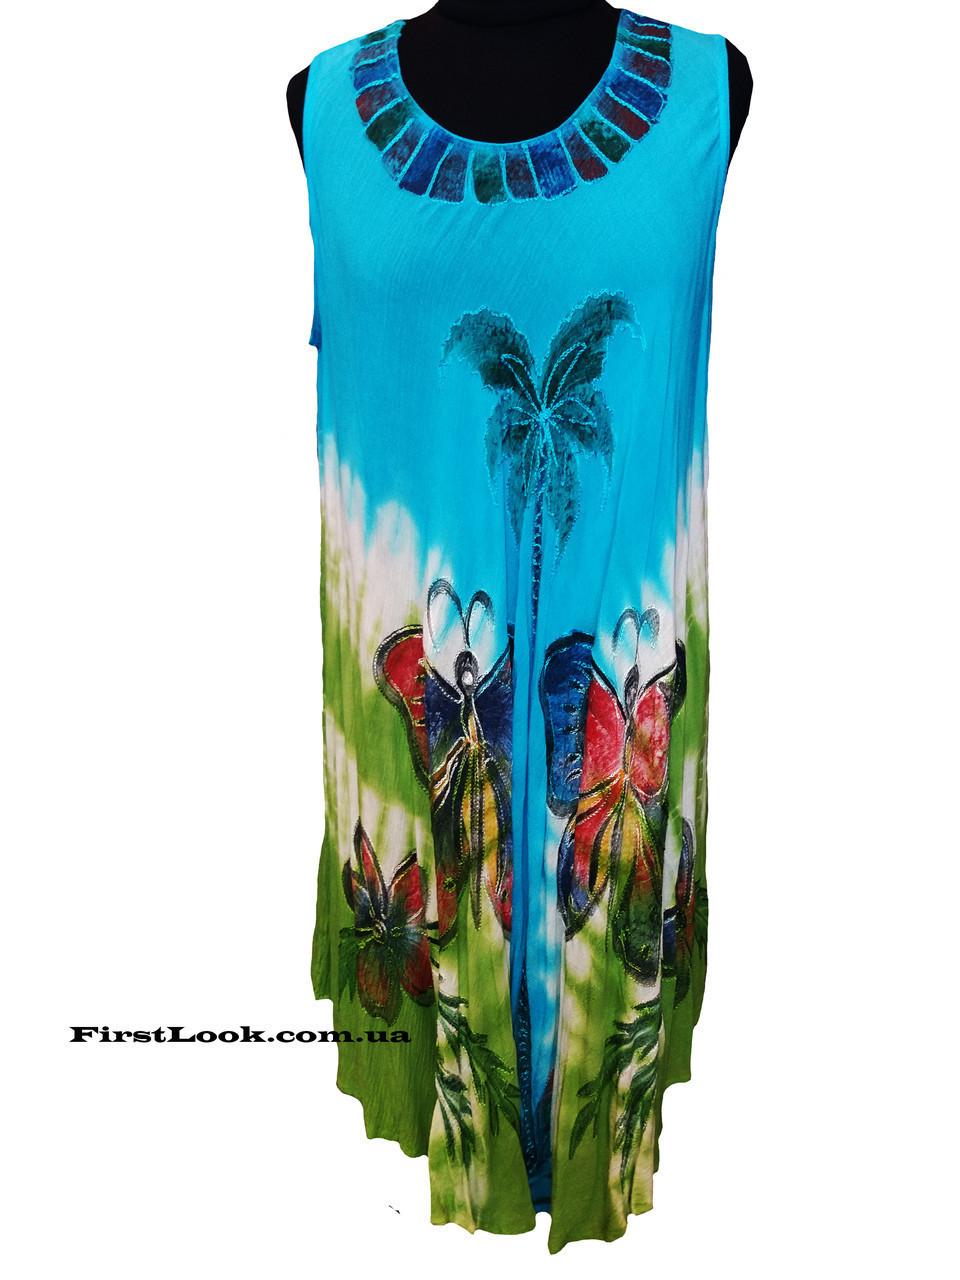 Пляжный женский сарафан ламбада (с 50-58 размер)